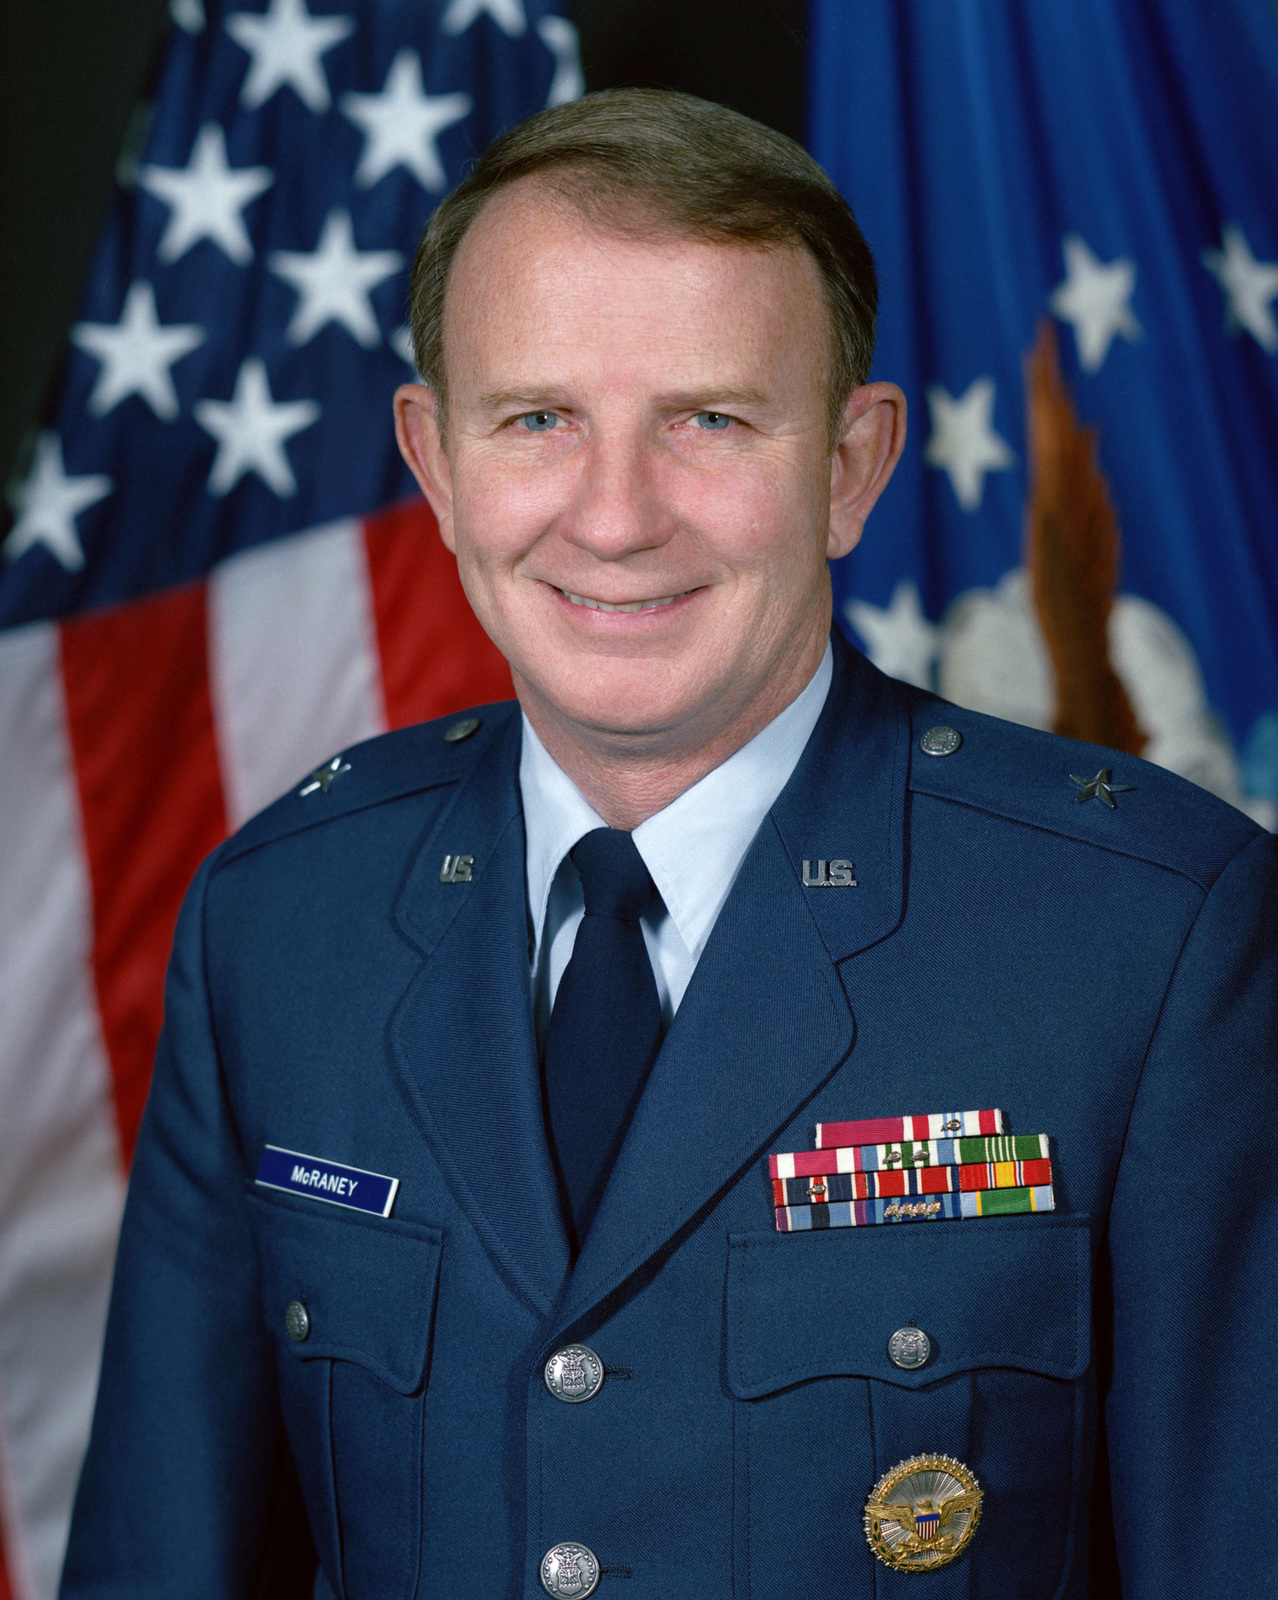 Brigadier General Michael P. McRaney, USAF (uncovered)